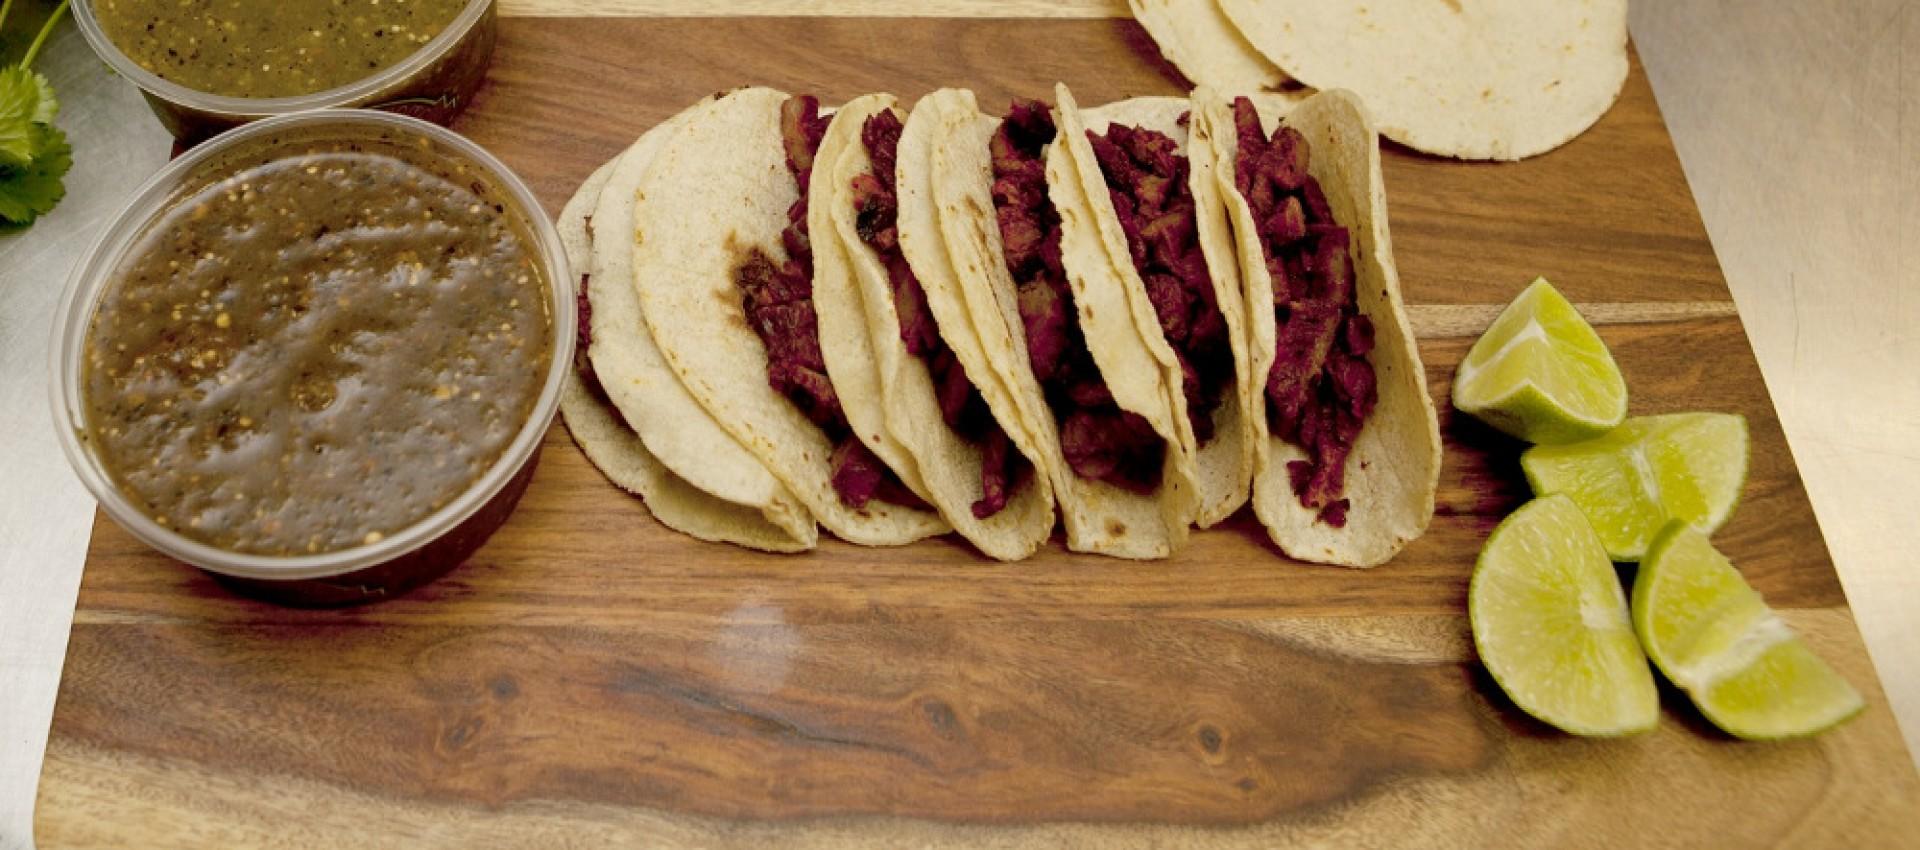 Imagen de Tacos al pastor